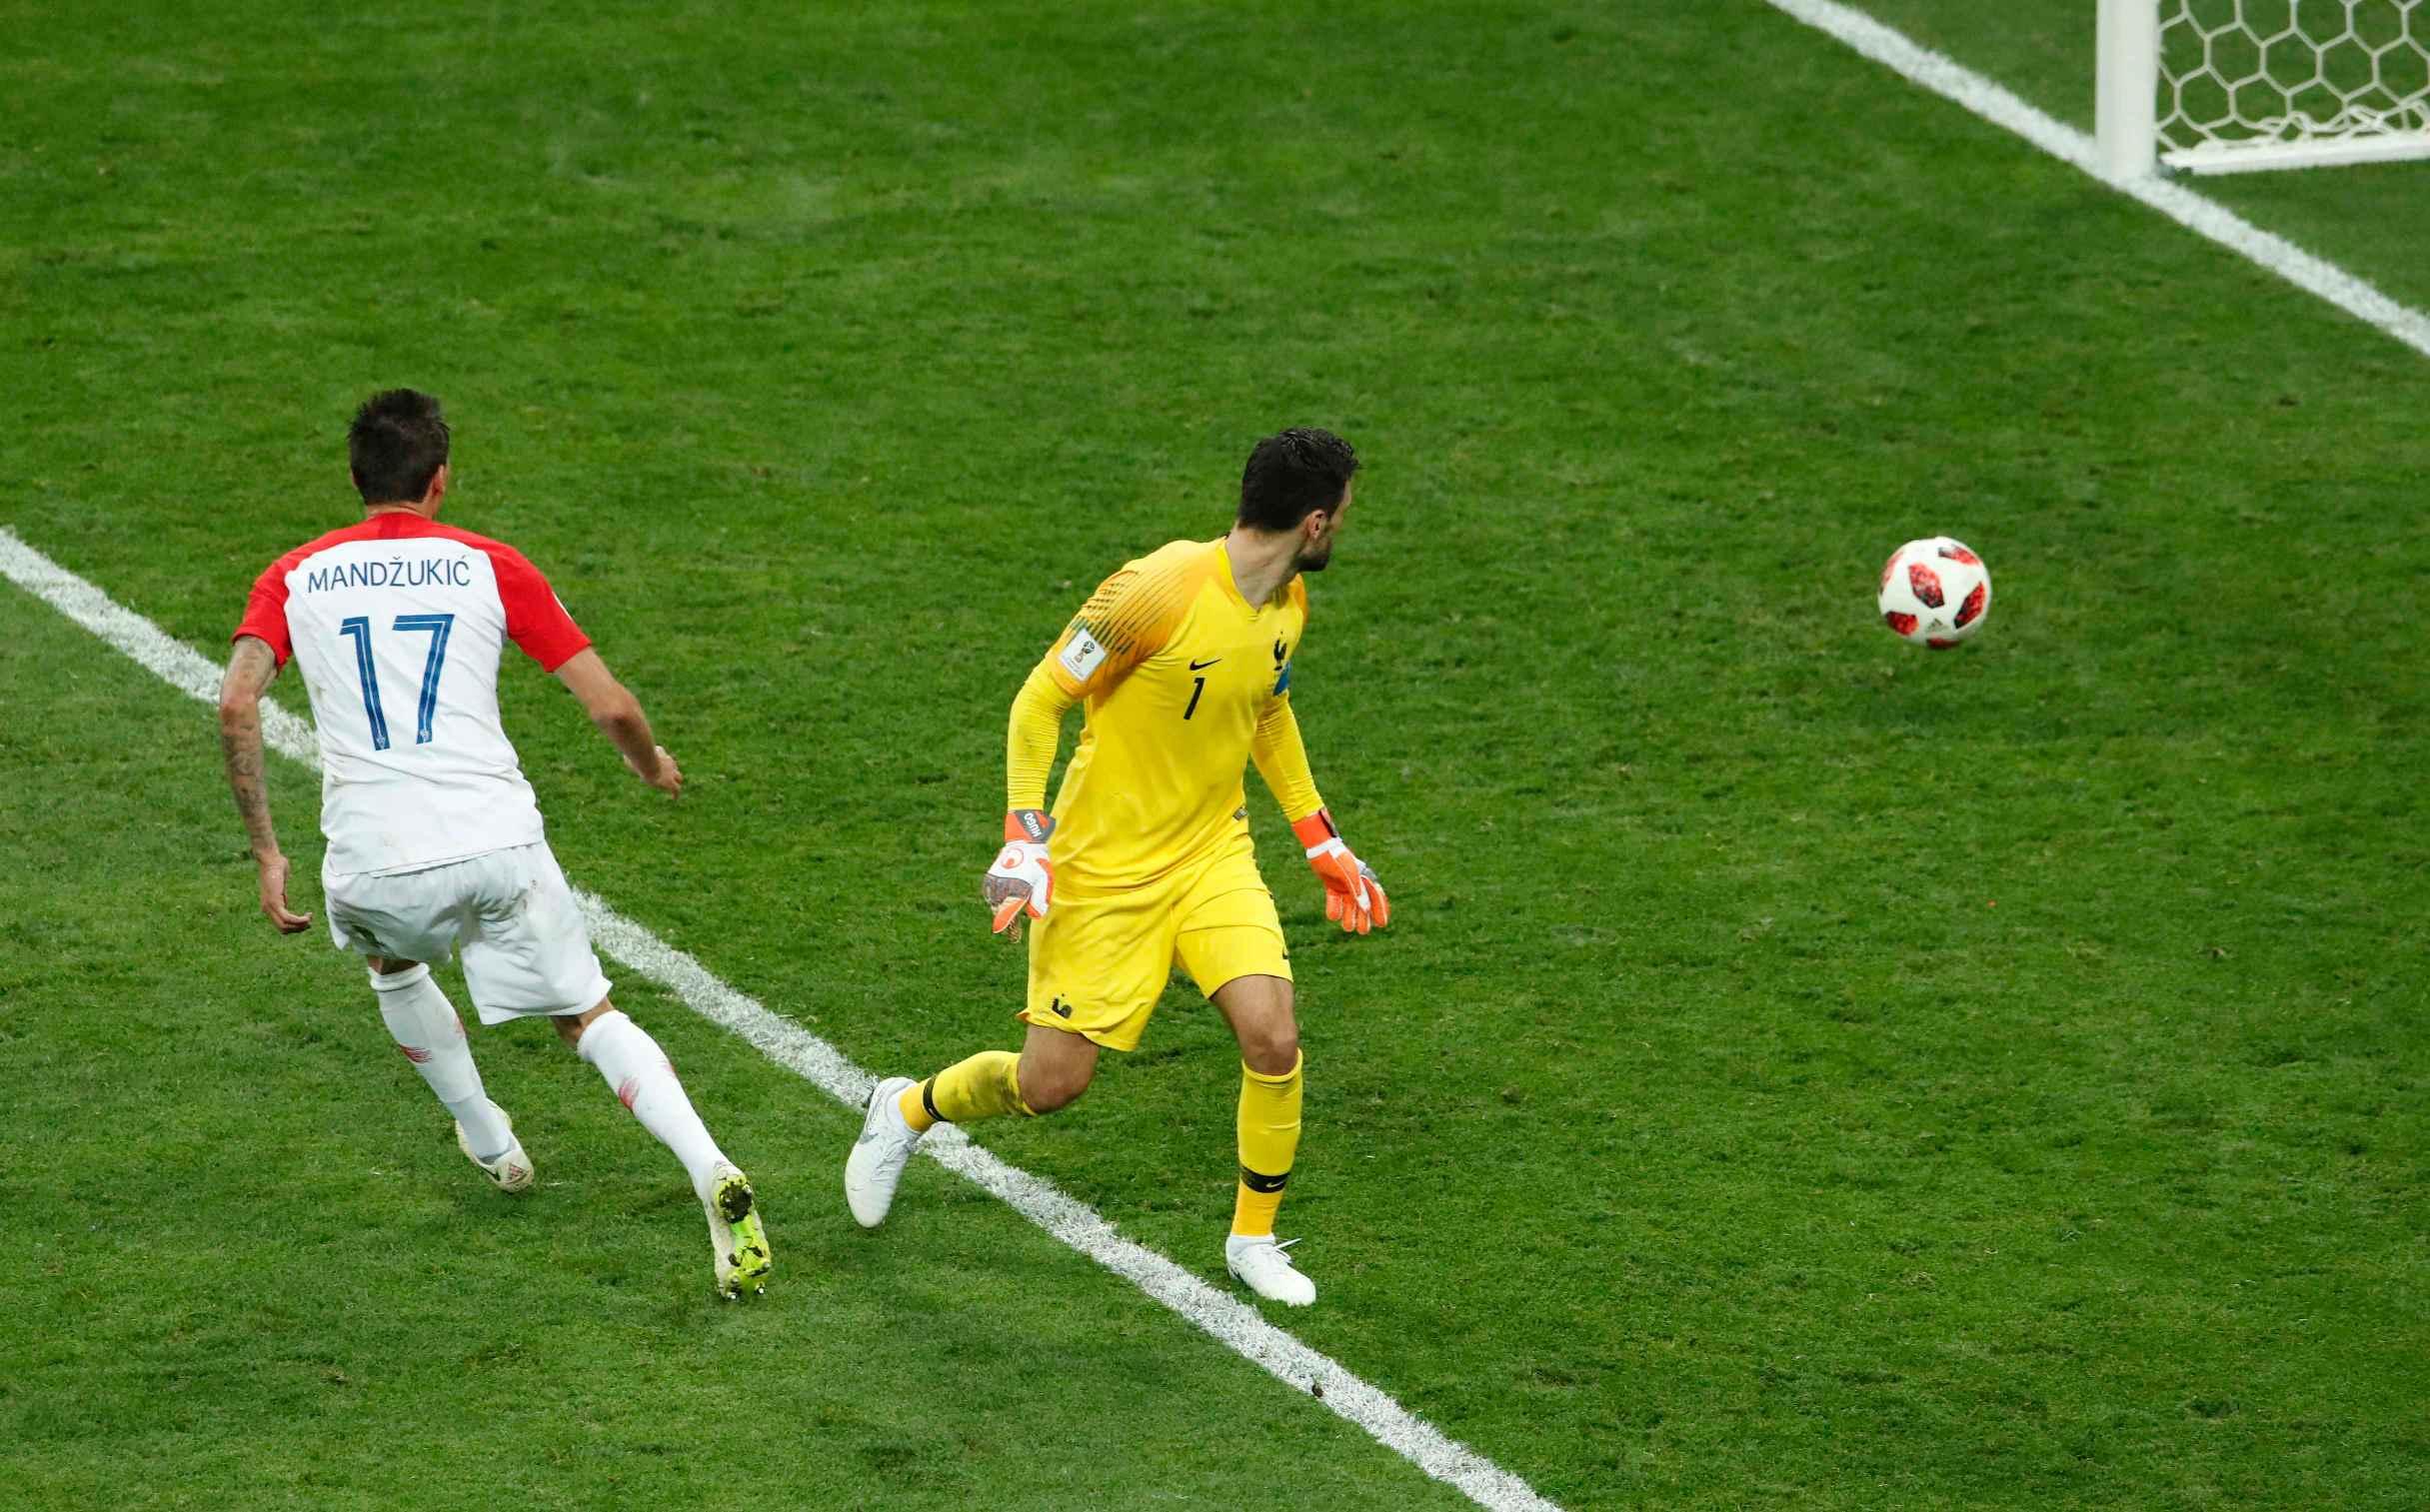 Soccer Football - World Cup - Final - France v Croatia - Luzhniki Stadium, Moscow, Russia - July 15, 2018 Croatia's Mario Mandzukic scores their second goal REUTERS/Maxim Shemetov